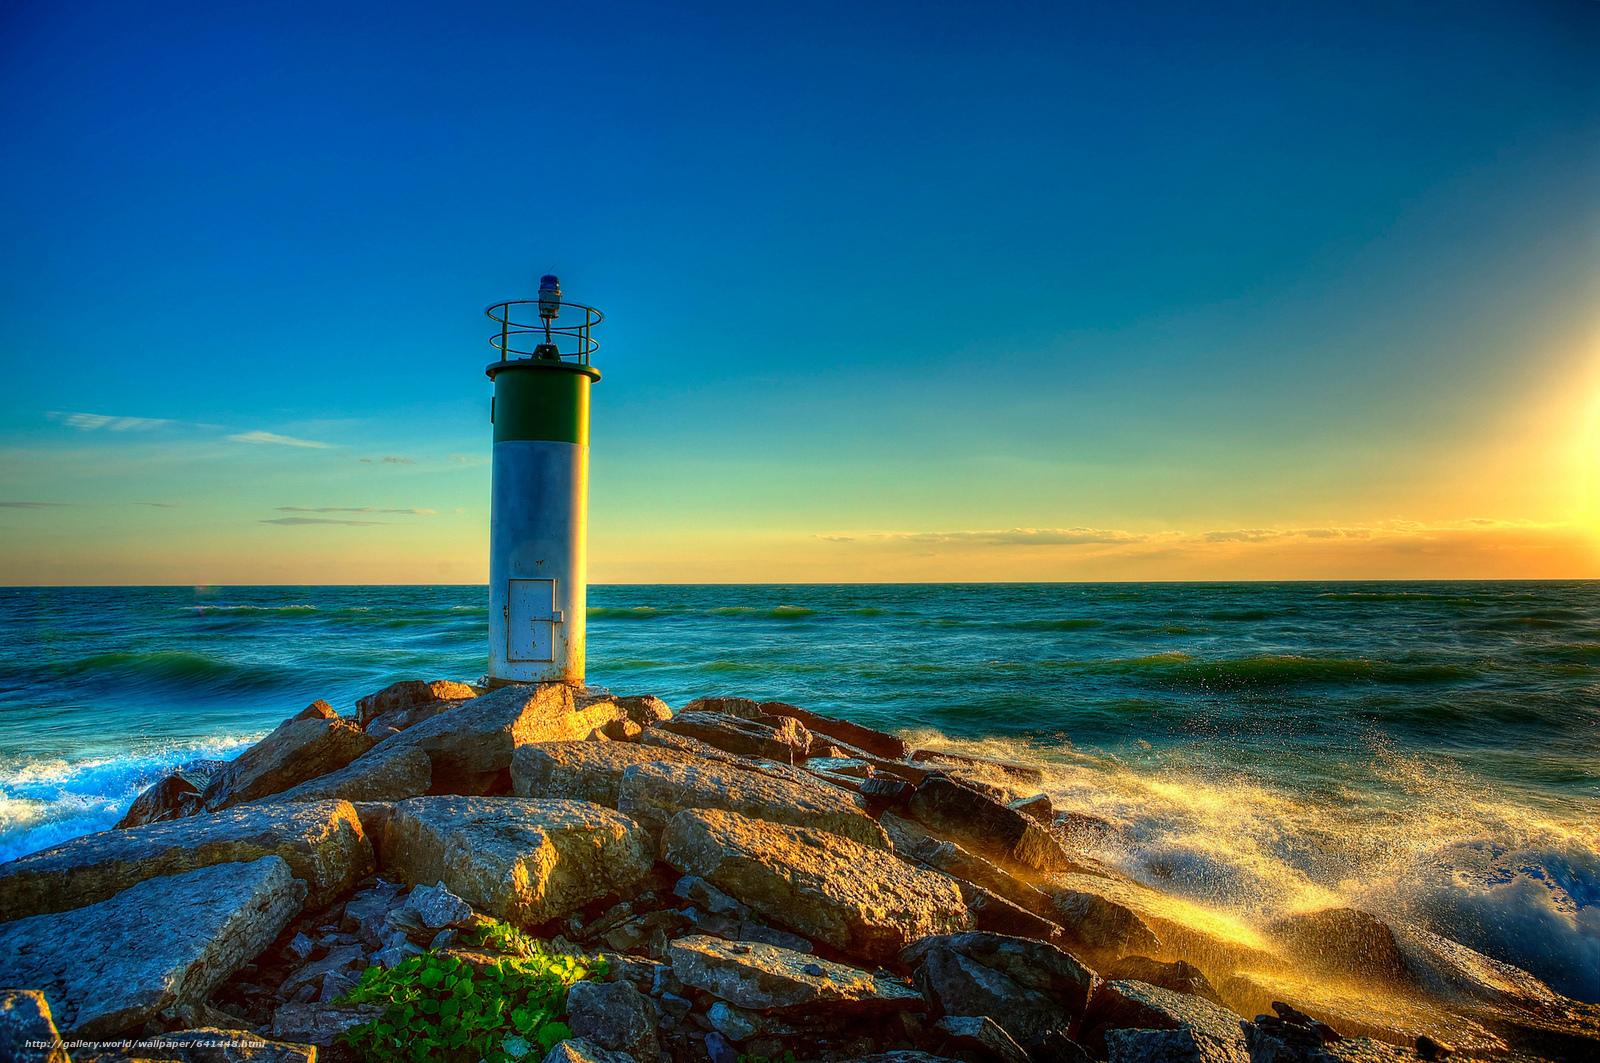 фото маяк на берегу моря фото полной мере